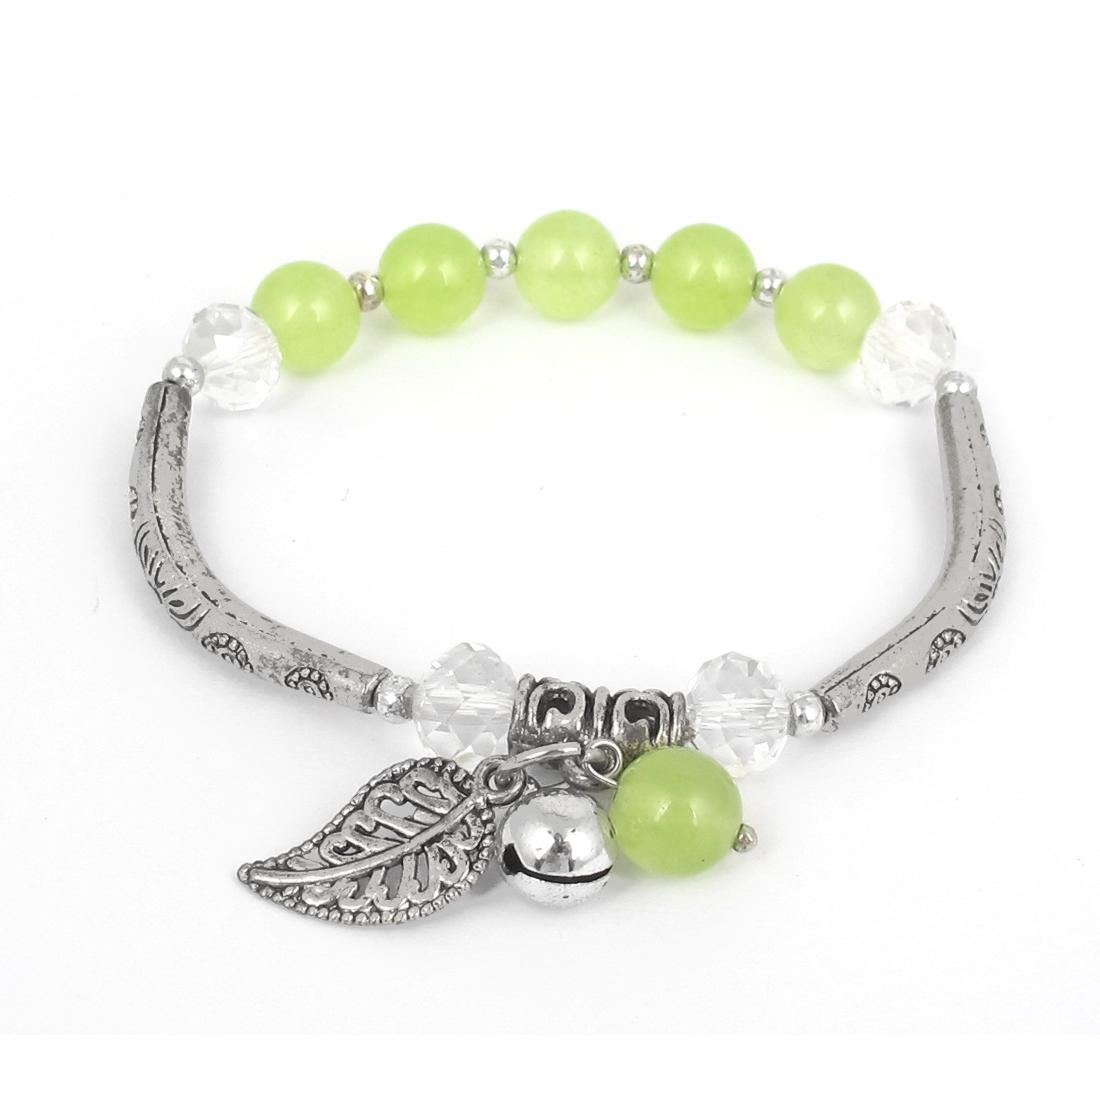 Jewelry Beads Stretchy Wrist Decor Bangle Bracelet Yellow Green for Lady